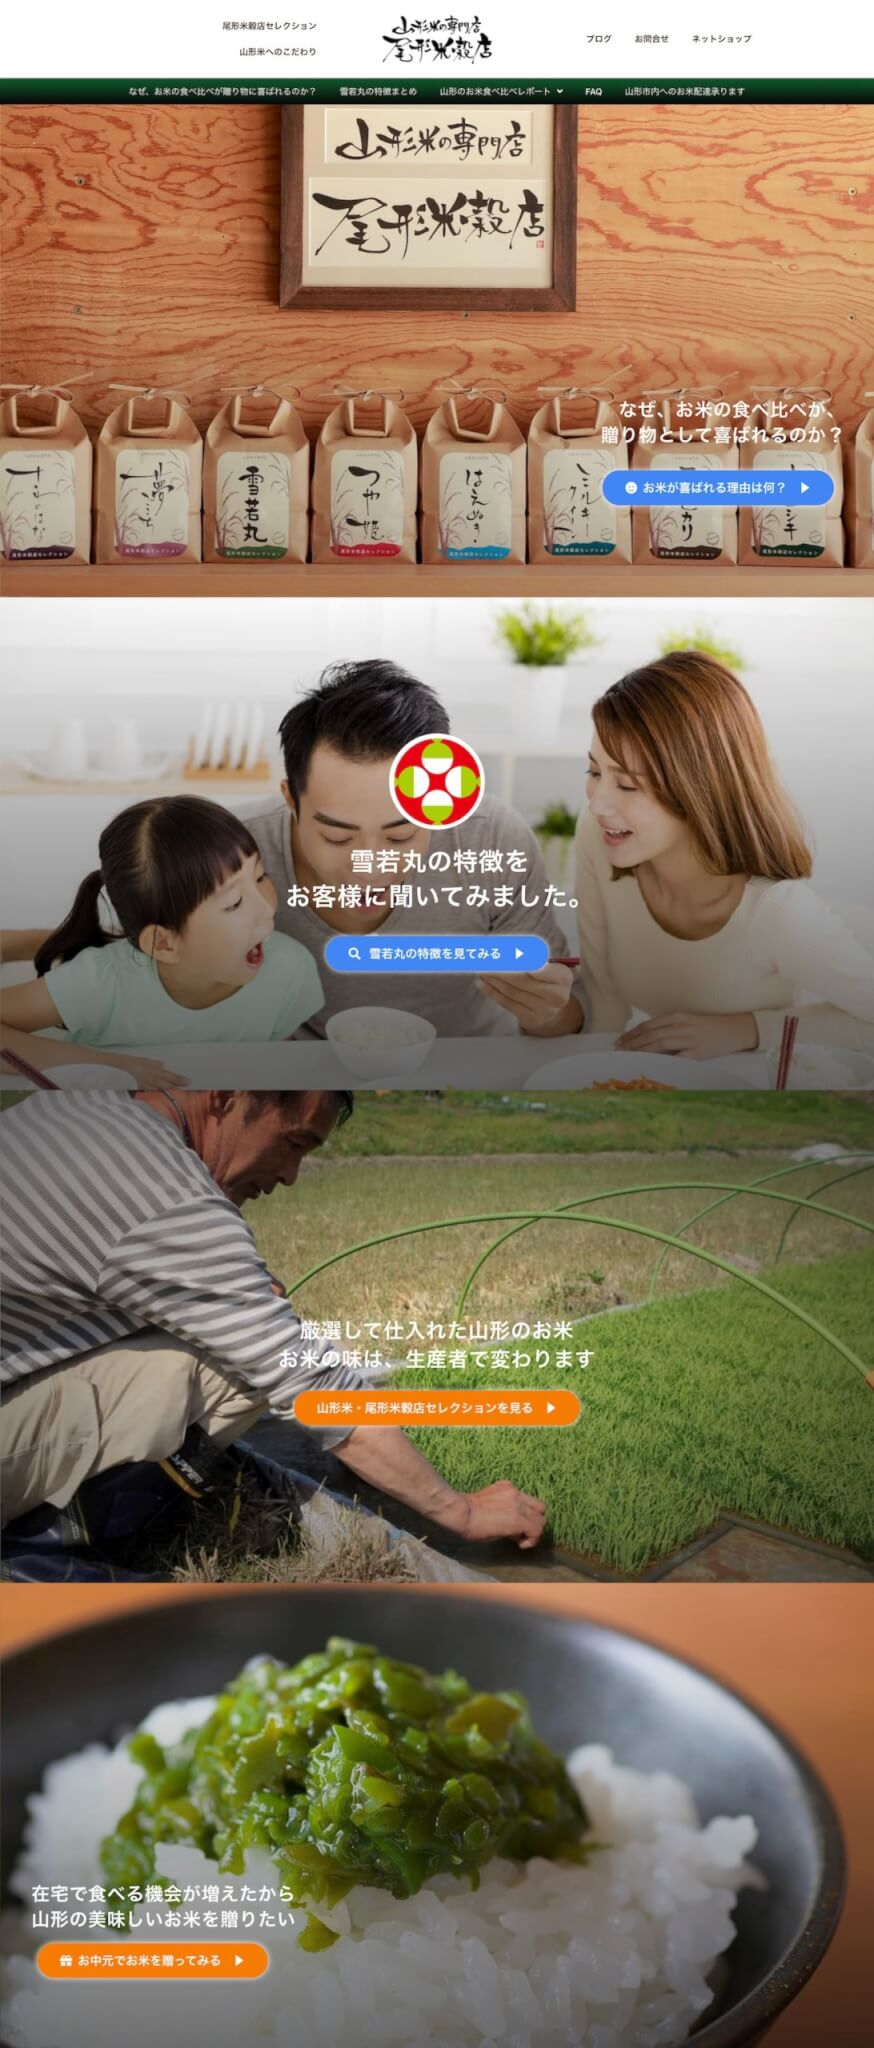 https://www.ogatabeikoku.com/